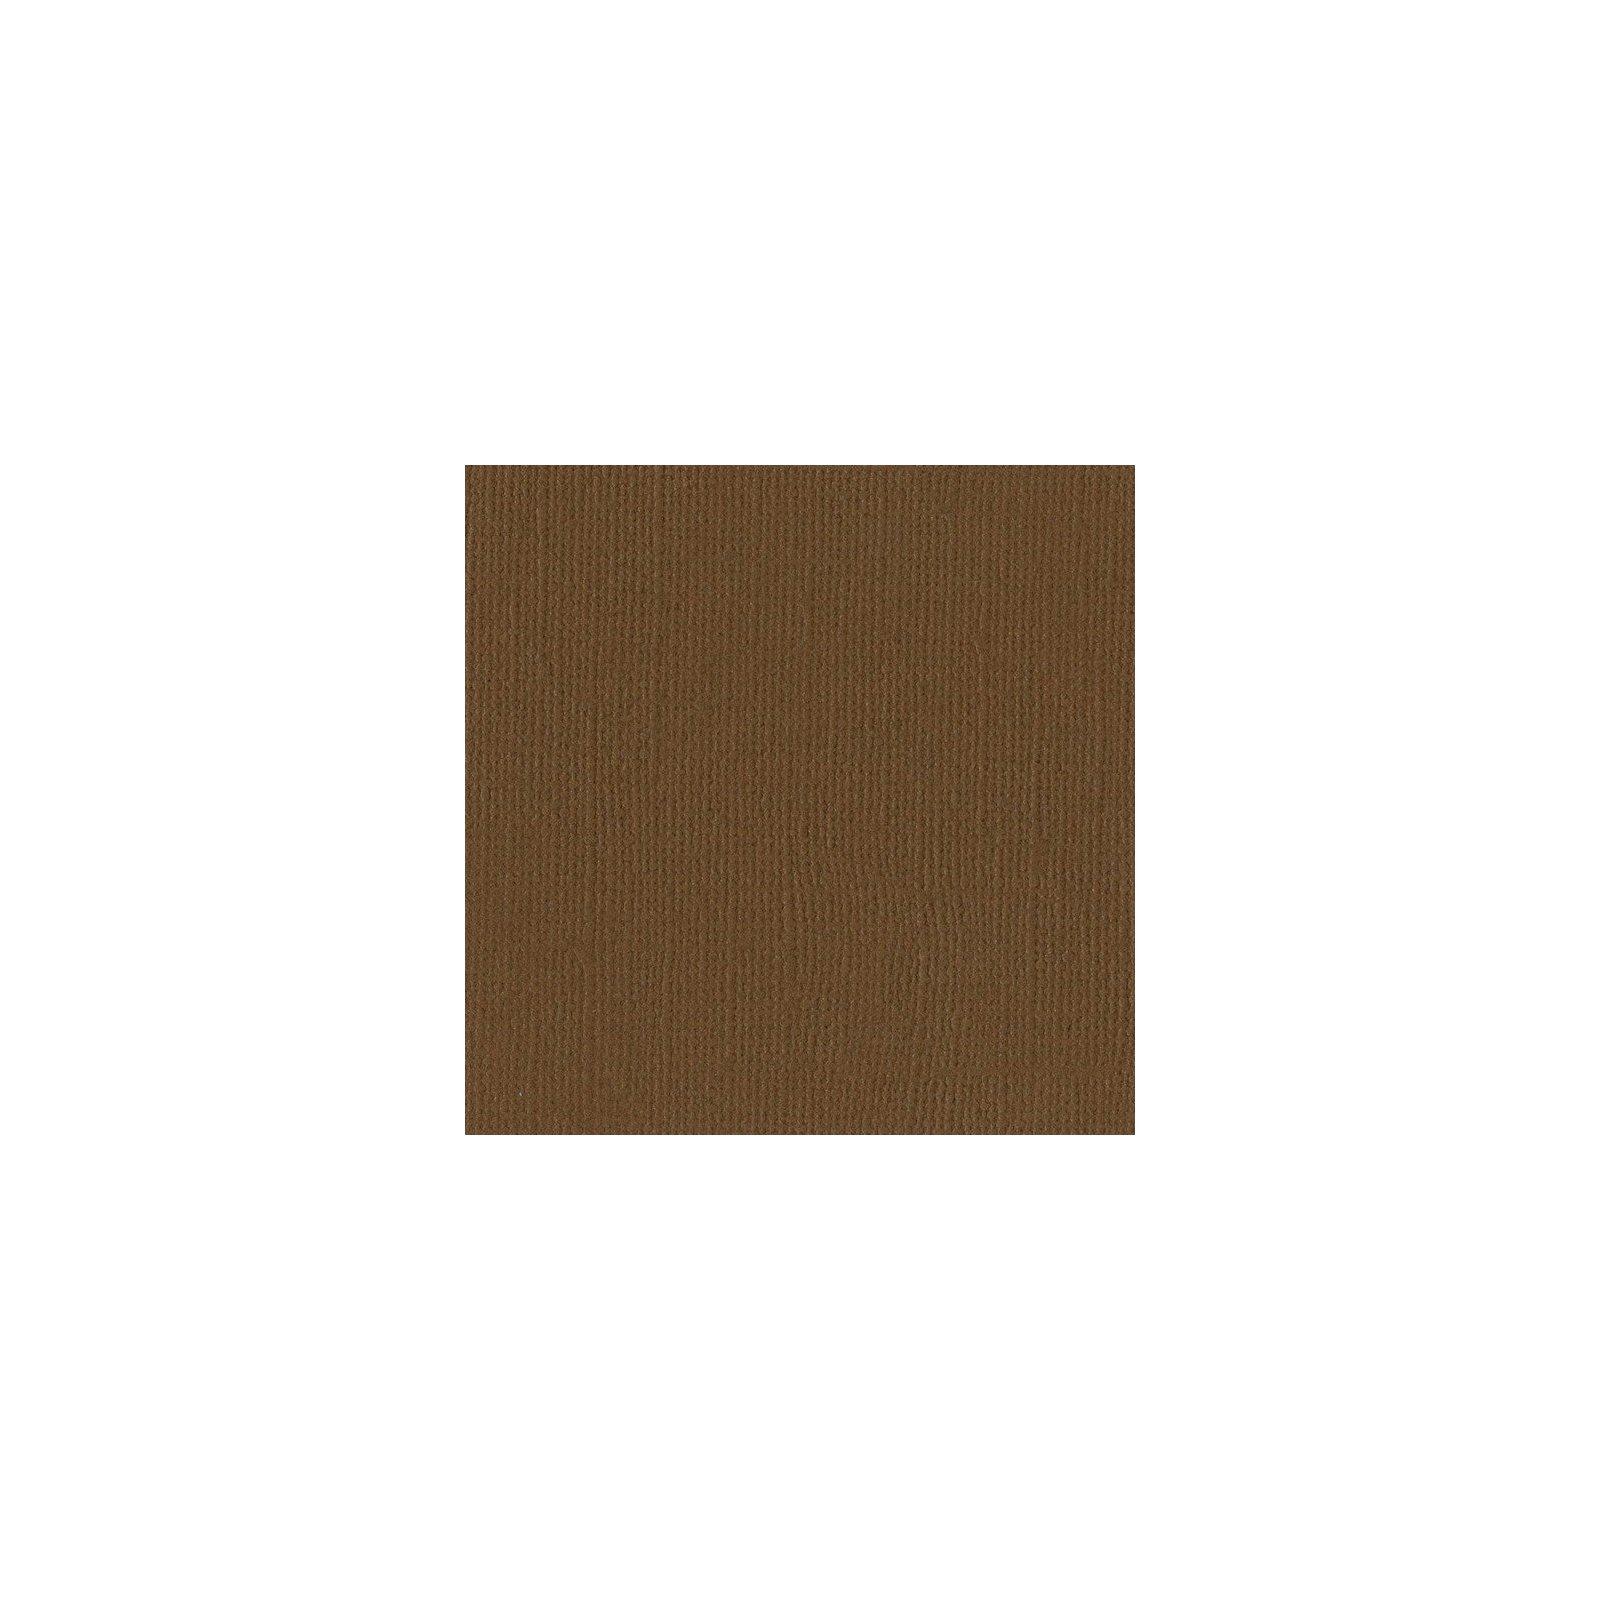 Papier marron « Walnut » - Noisette - Mono - Bazzill Basics Paper